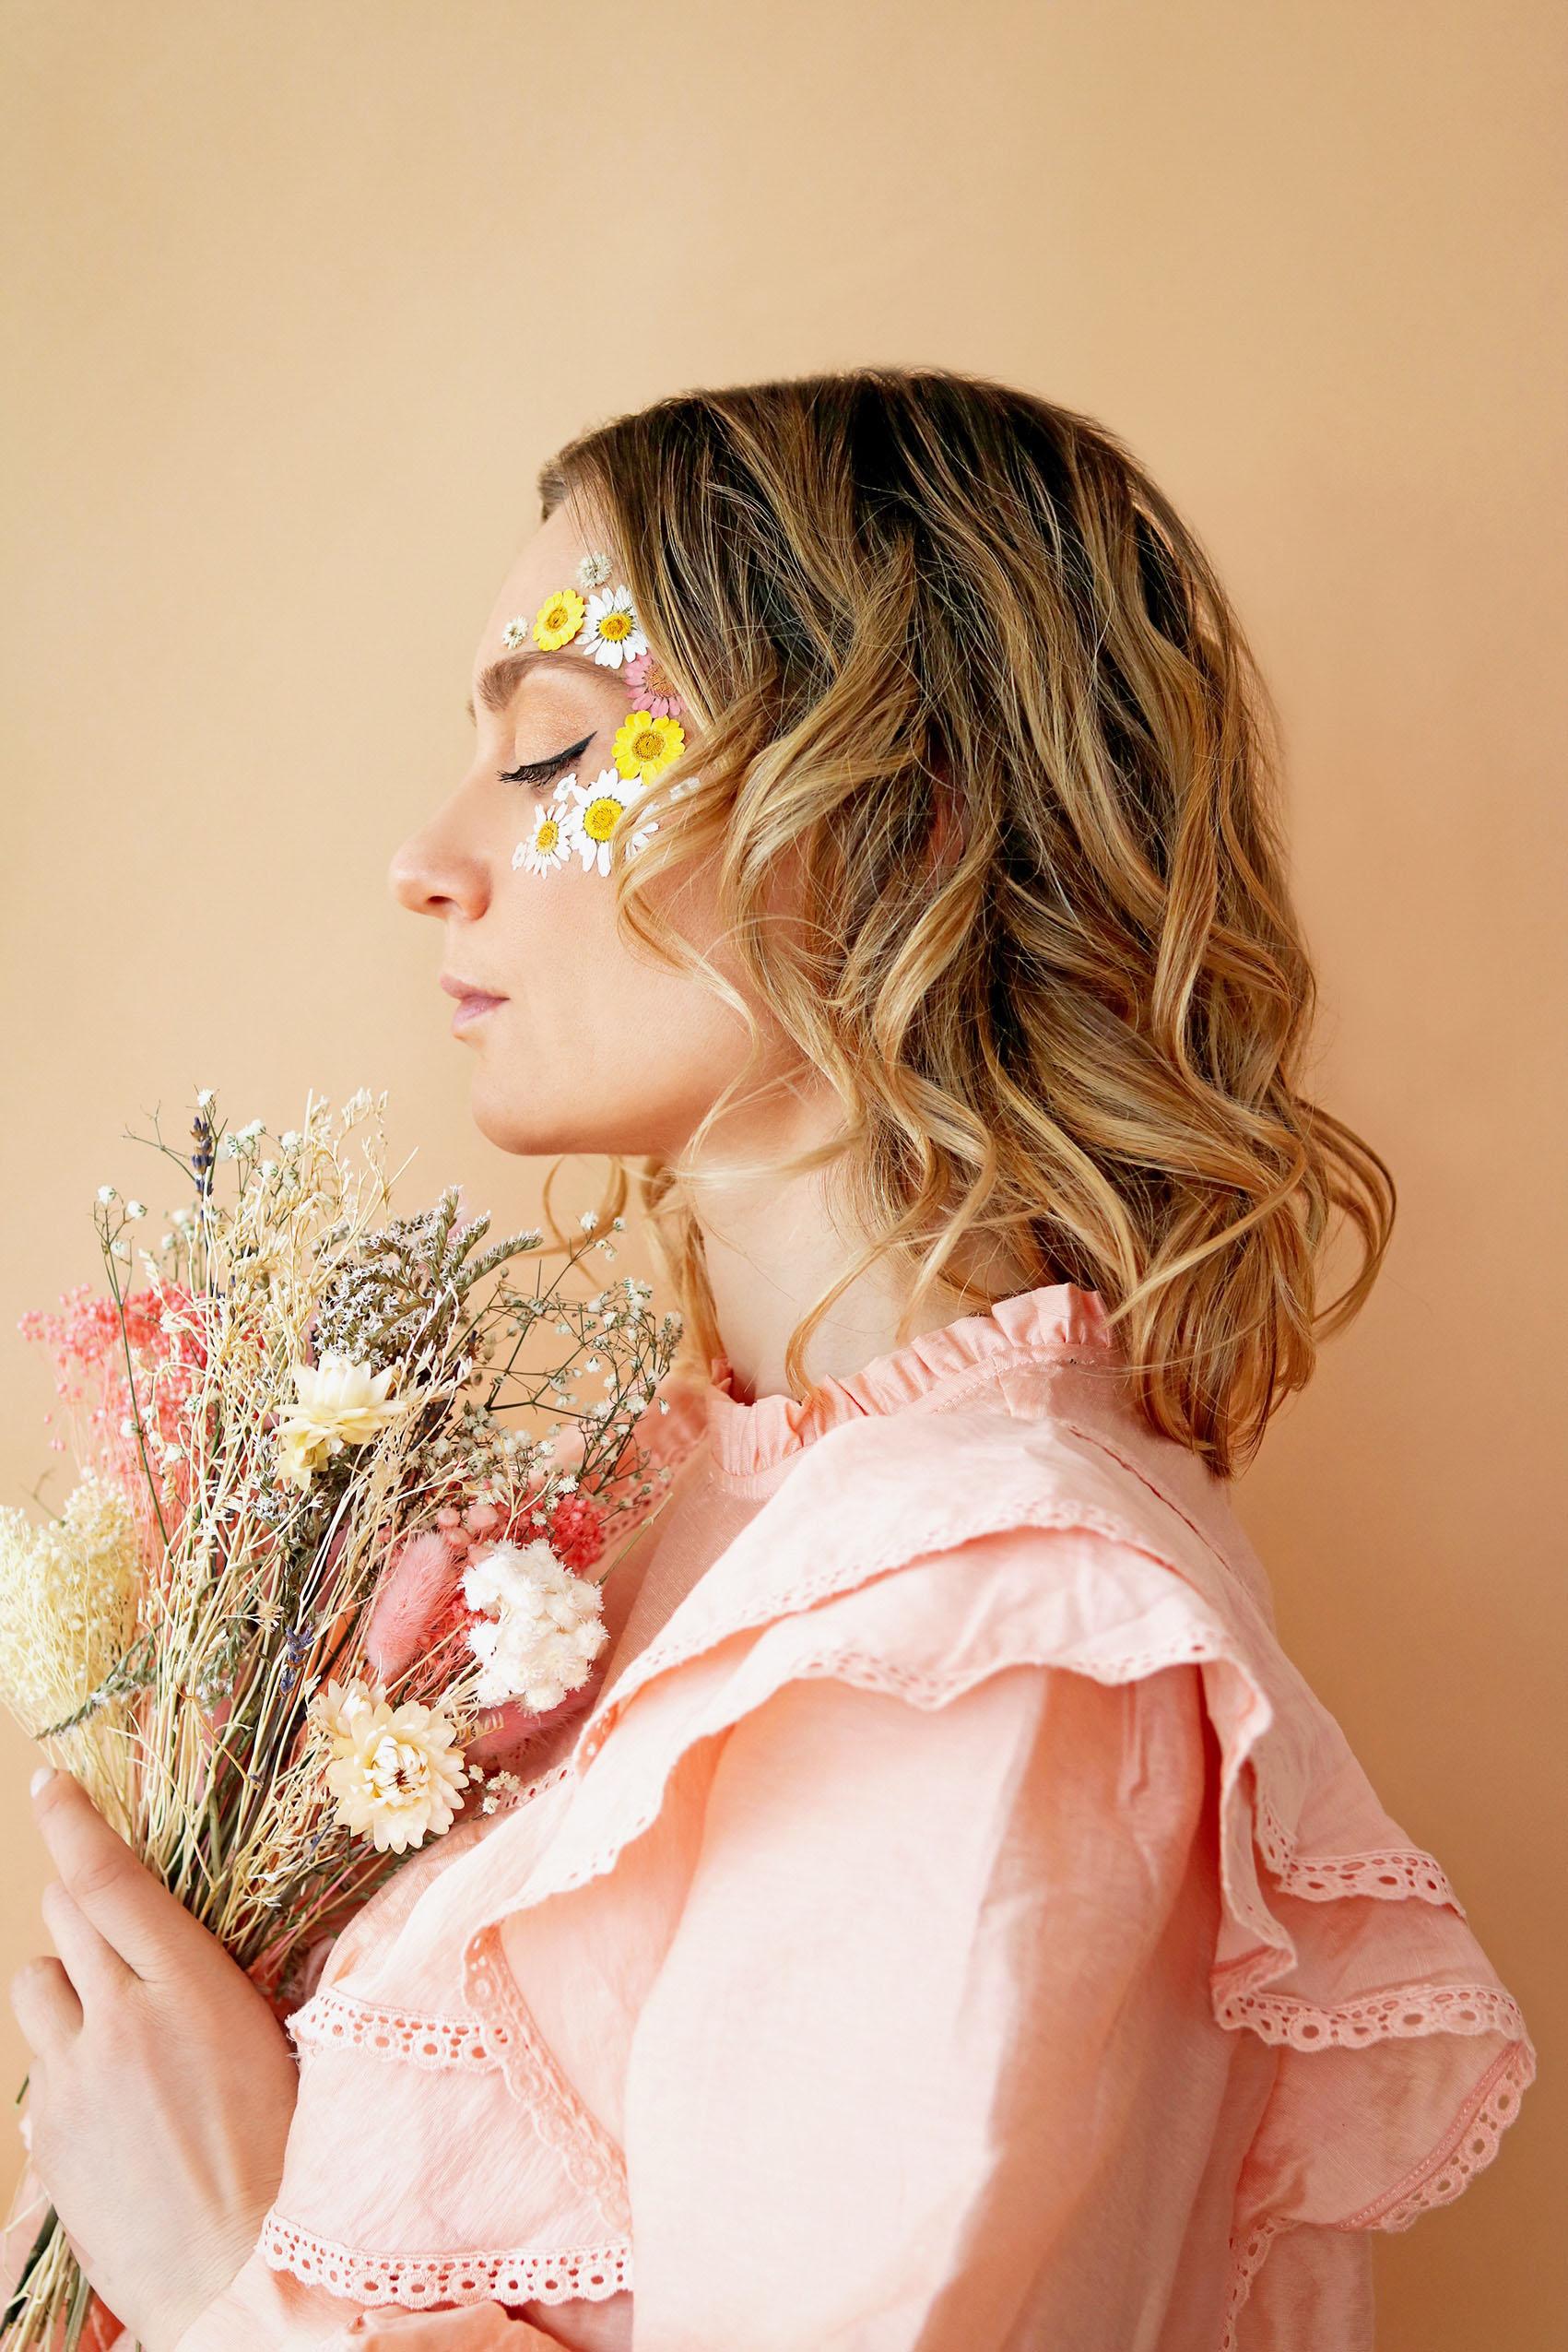 diy-maquillage-fleuri-fleurs-sechees